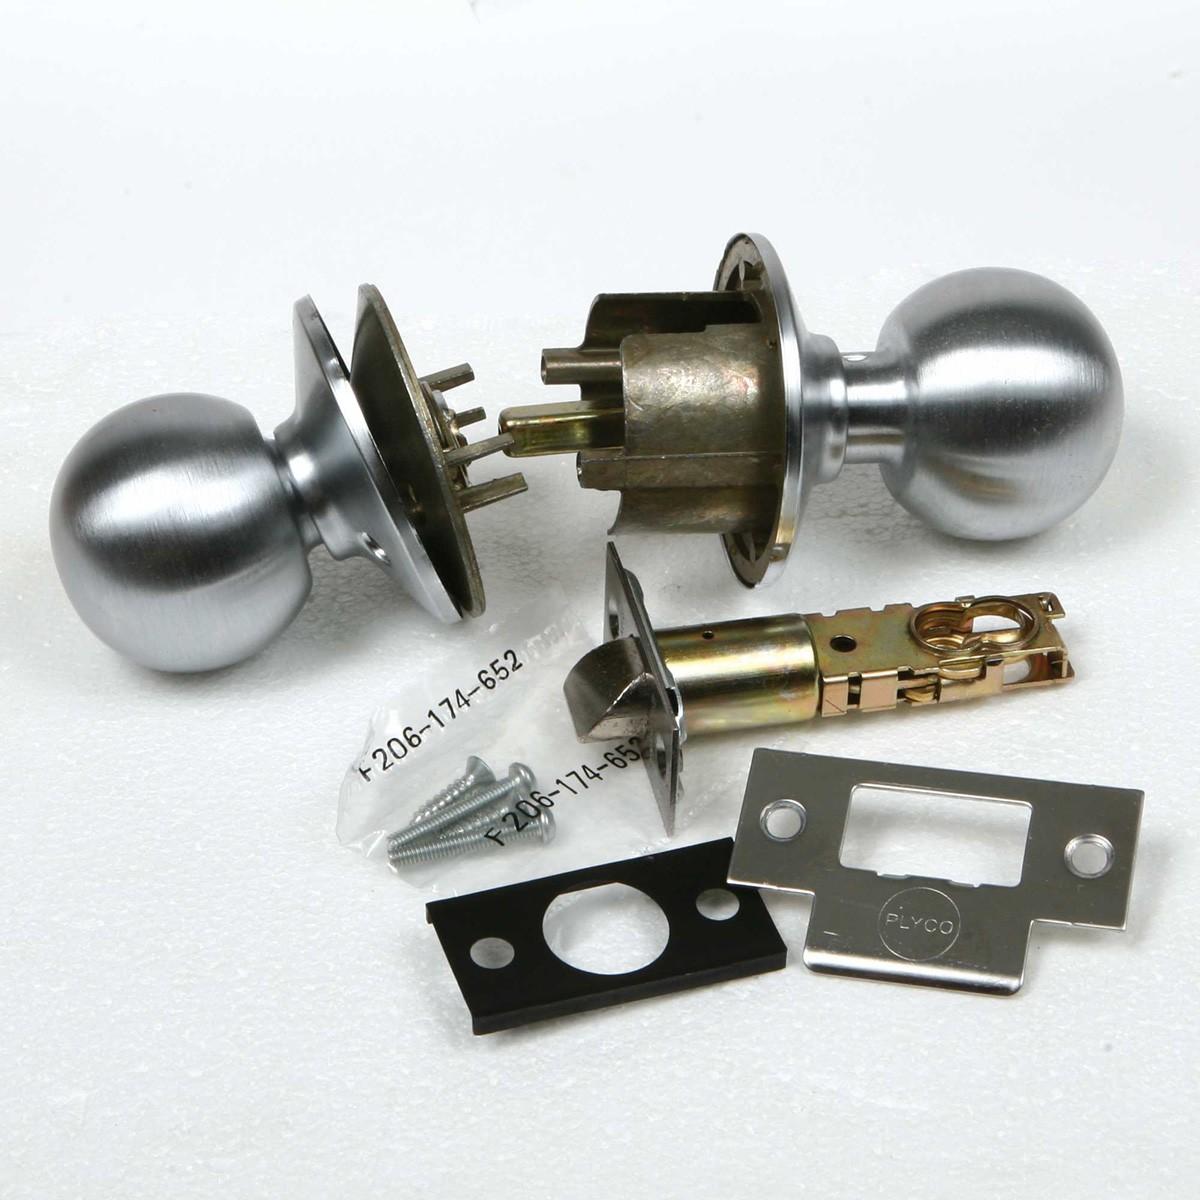 parts to a door knob photo - 1